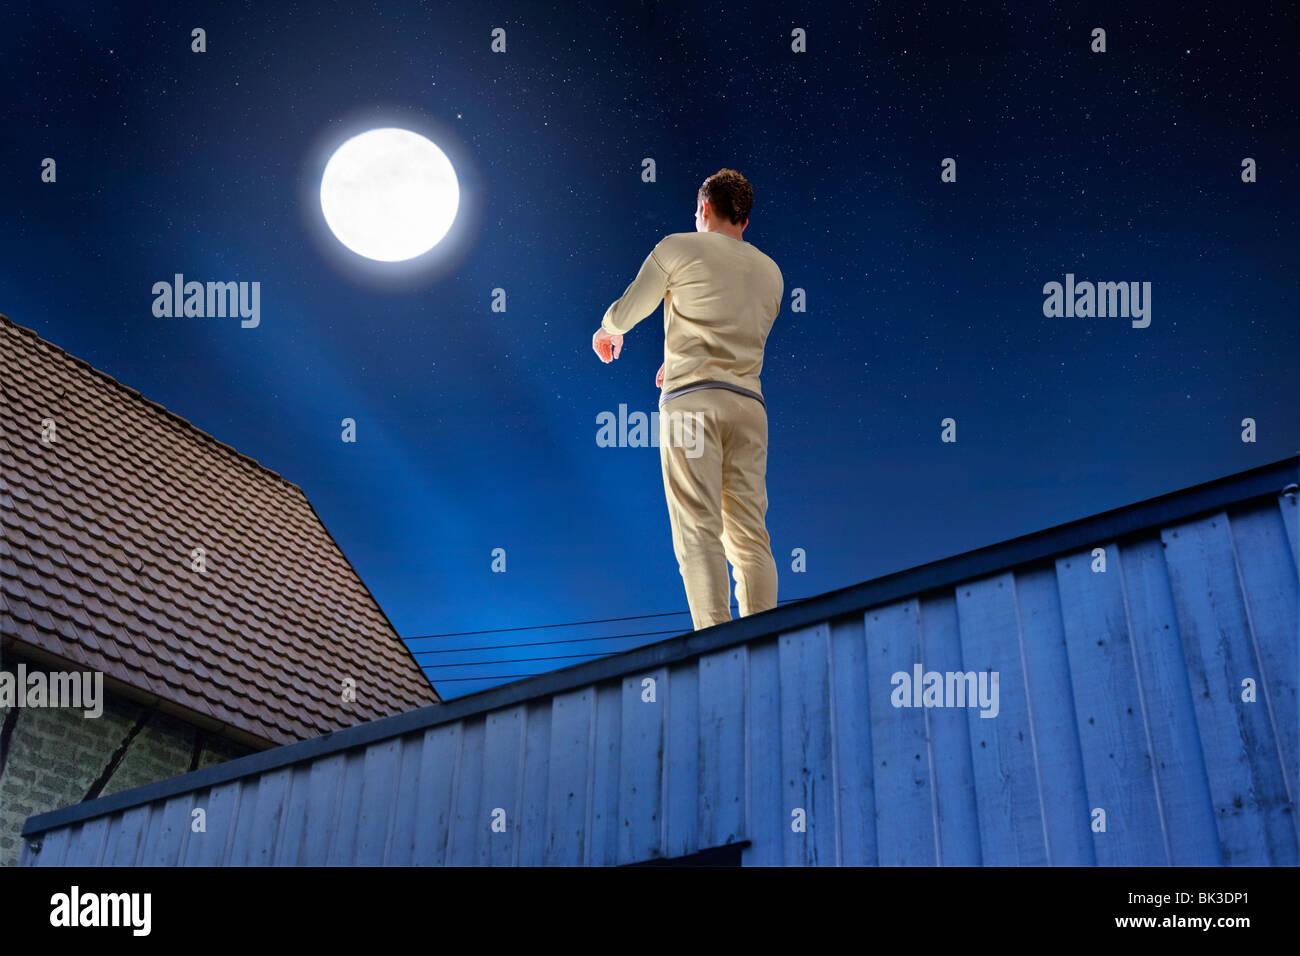 Sleepwalker strolling on a flat roof under a full moon - Stock Image